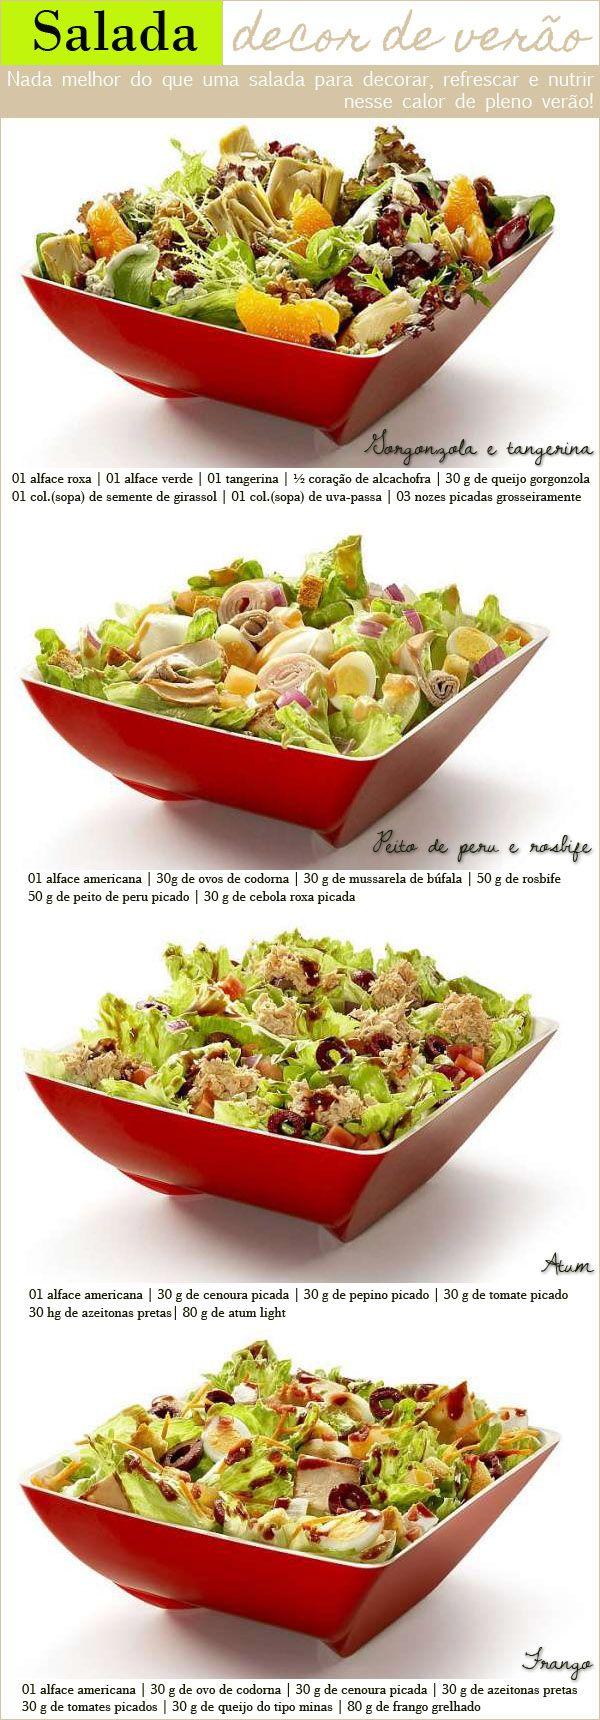 salada-decor-verao